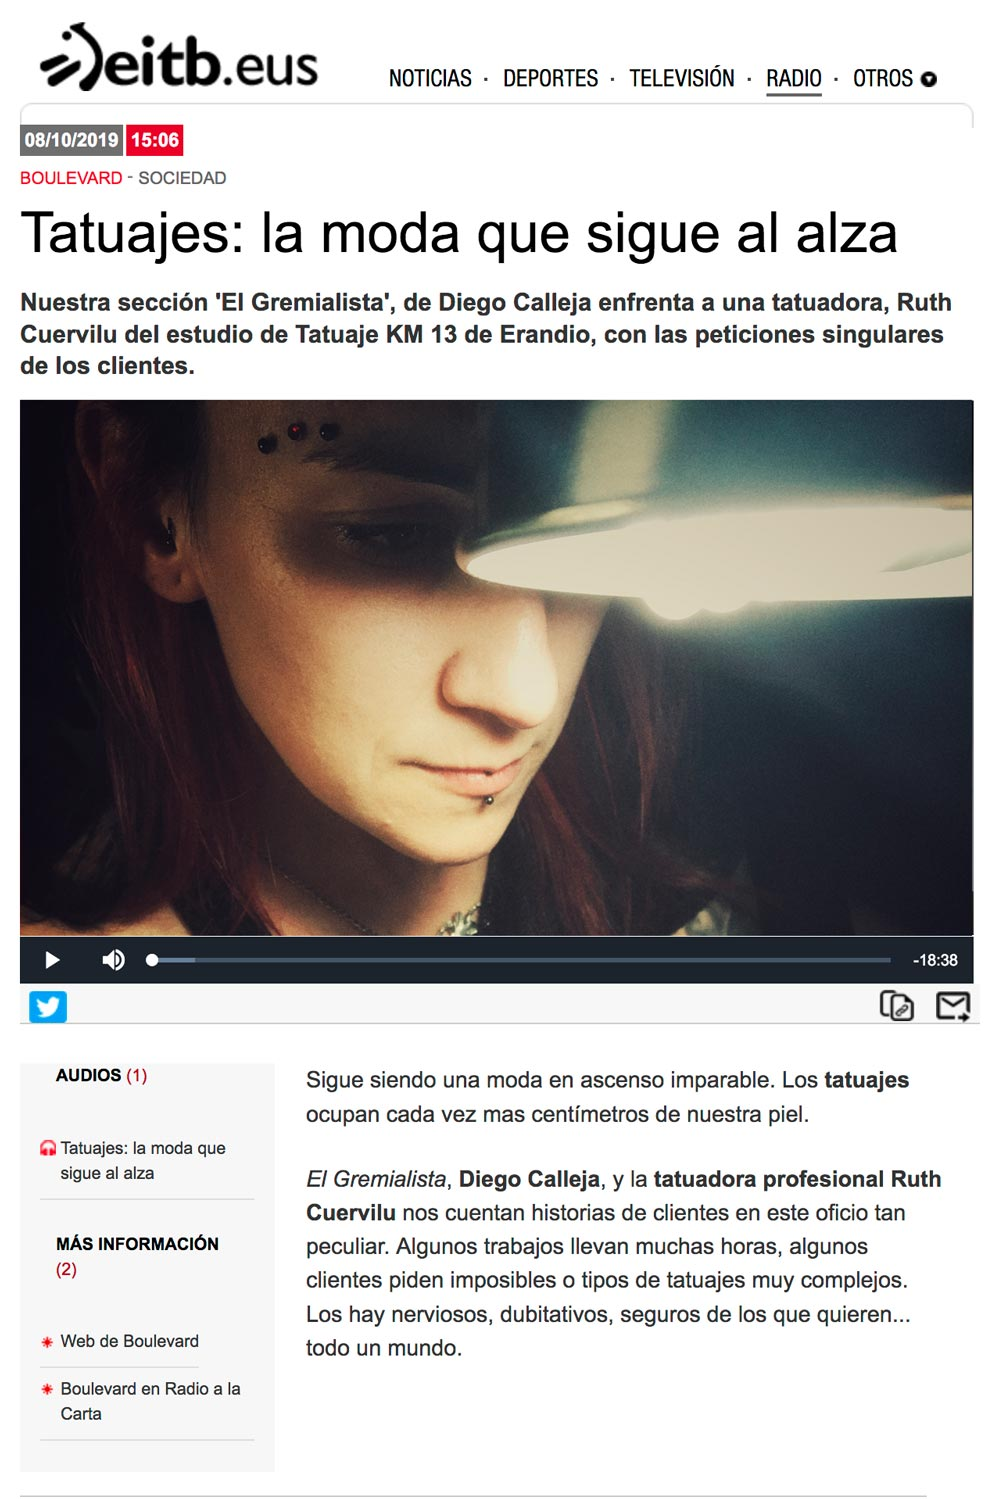 Ruth Cuervilu Tattoo de KM13 Studio en Boulevard Magazine de Radio Euskadi